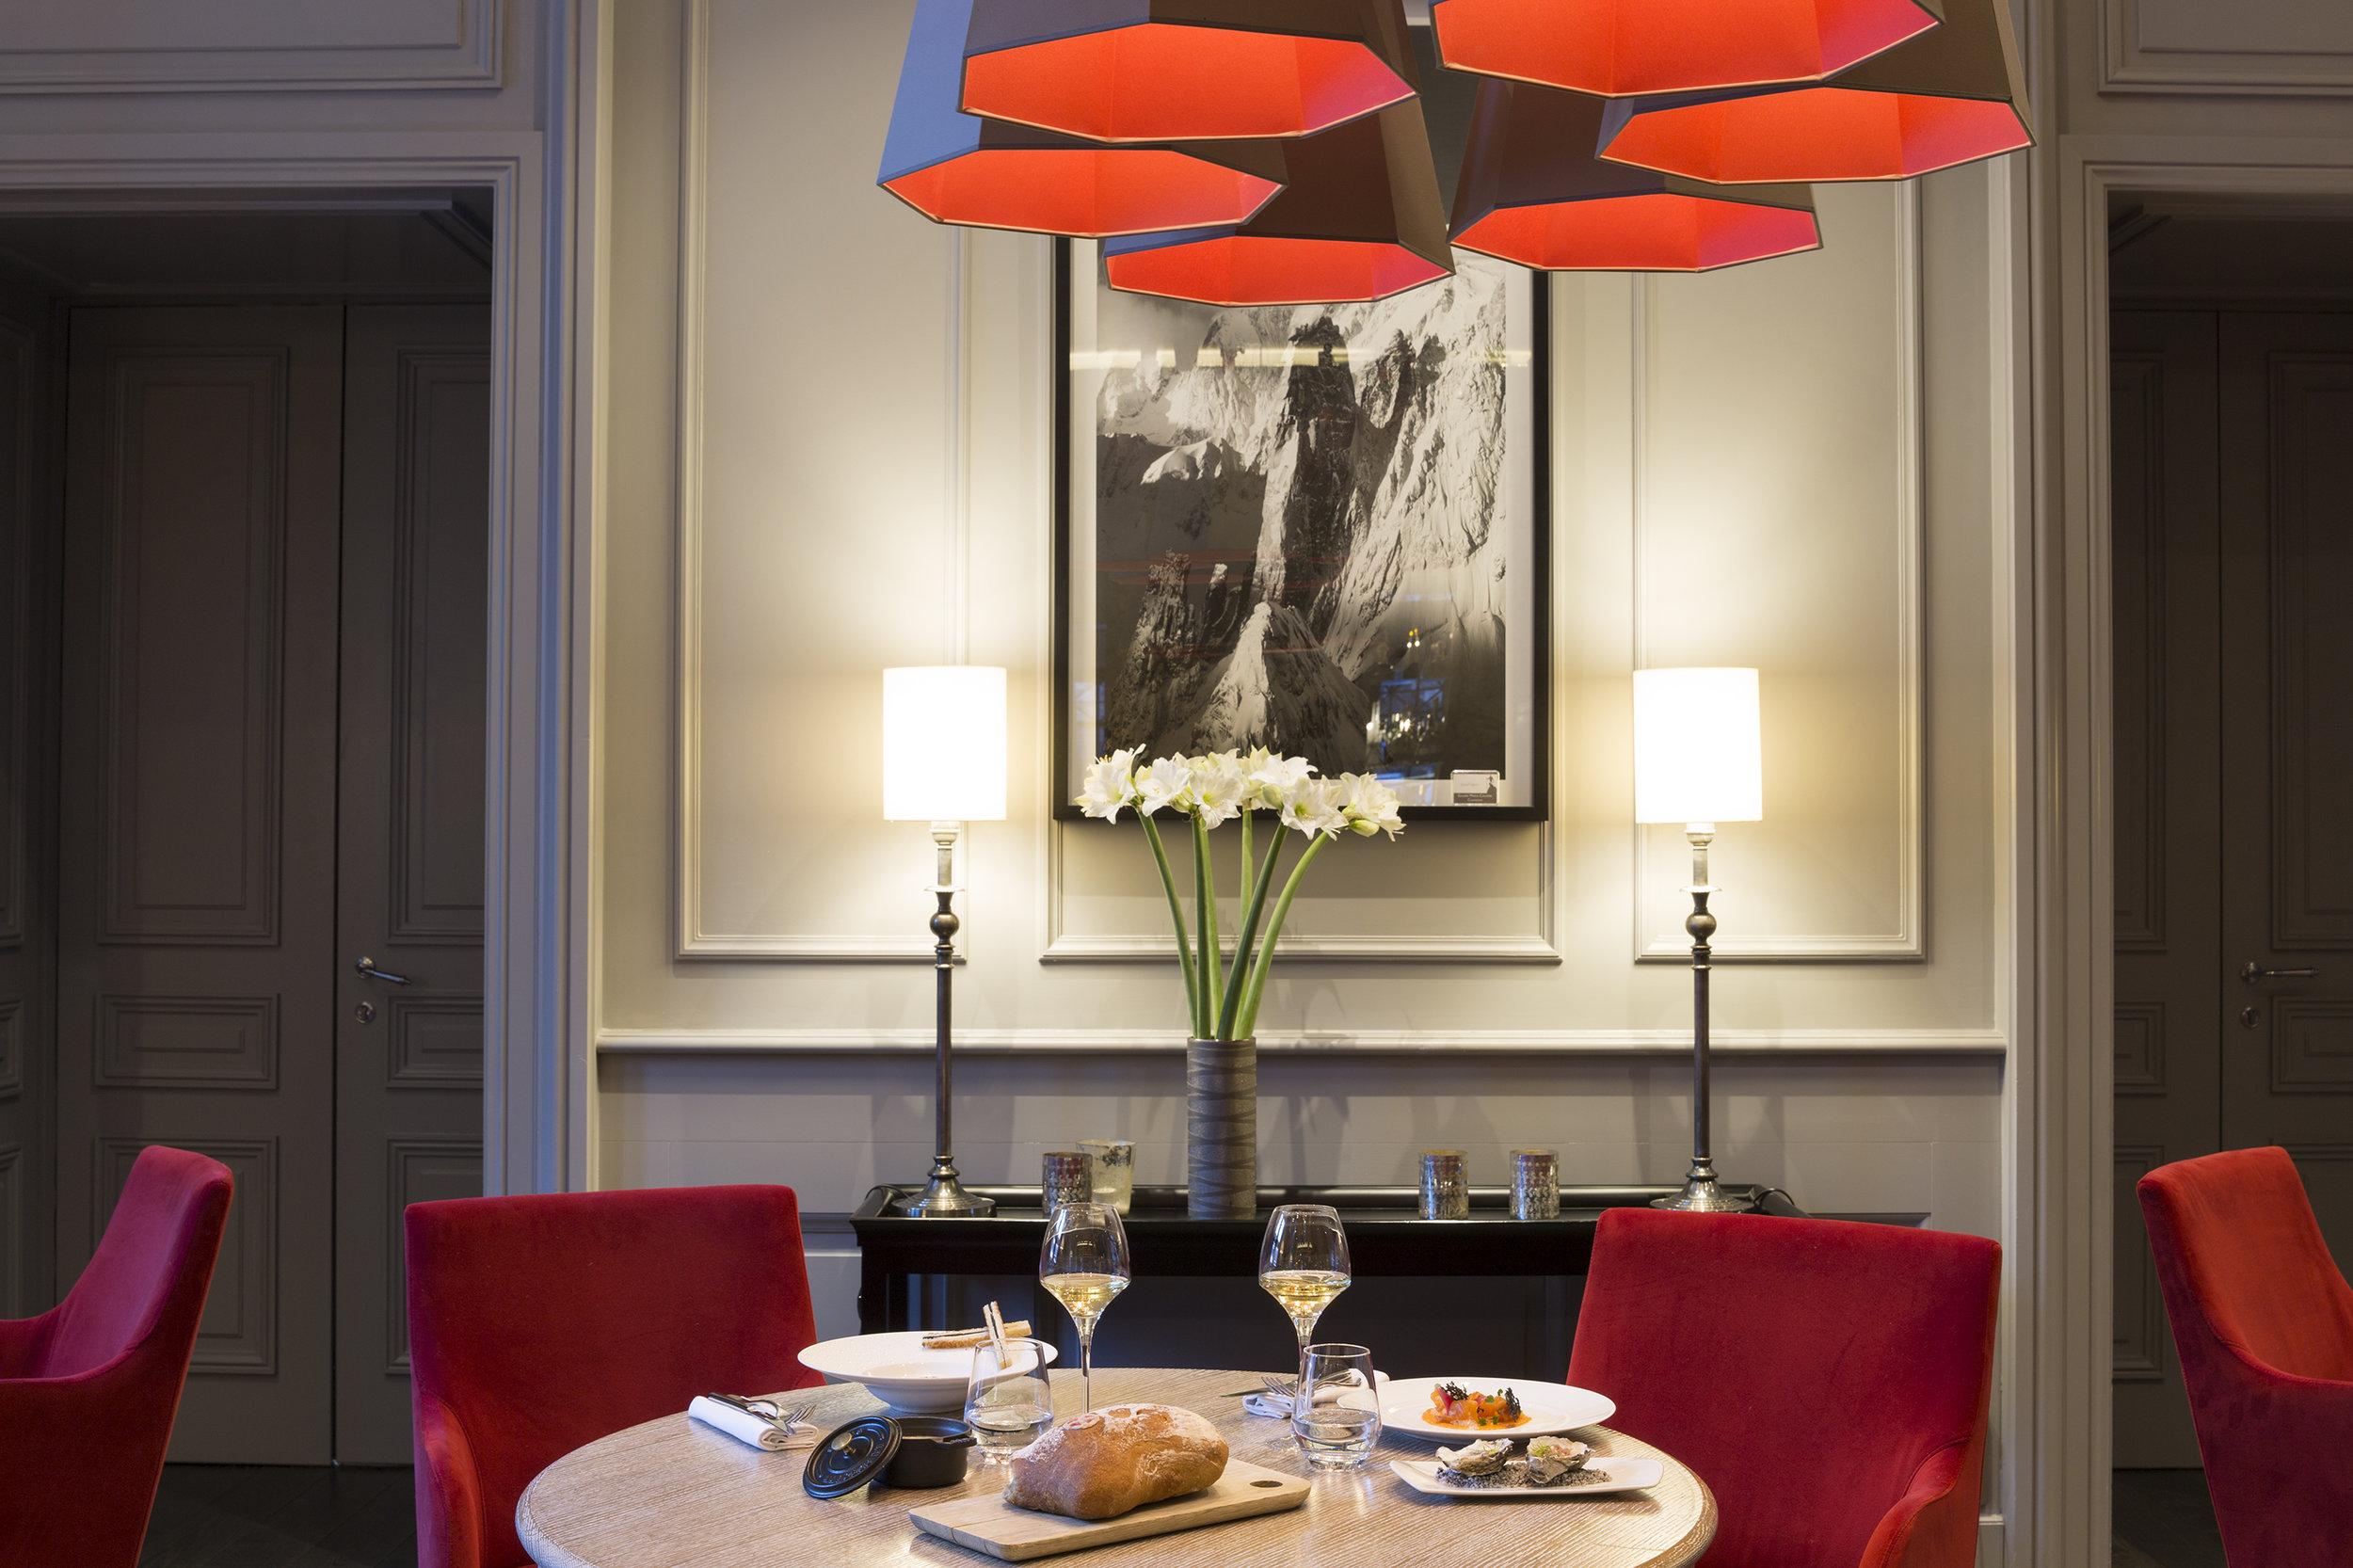 HotelMontBlanc-Restaurant-9.jpg